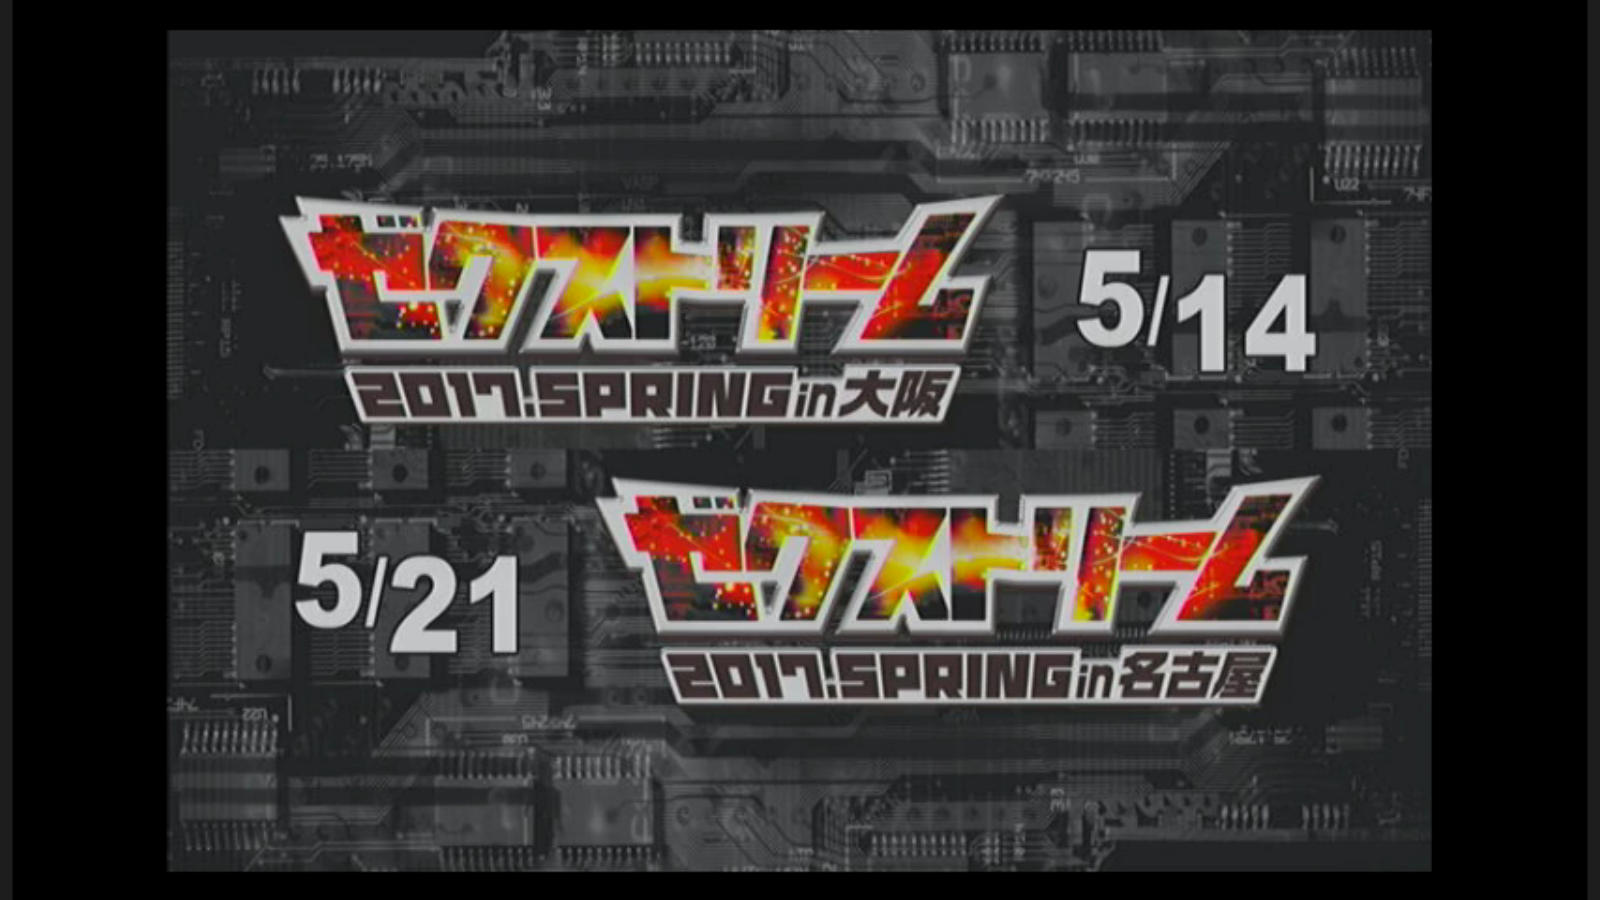 zx-zxtreme-2017spring-20170312-035.jpg